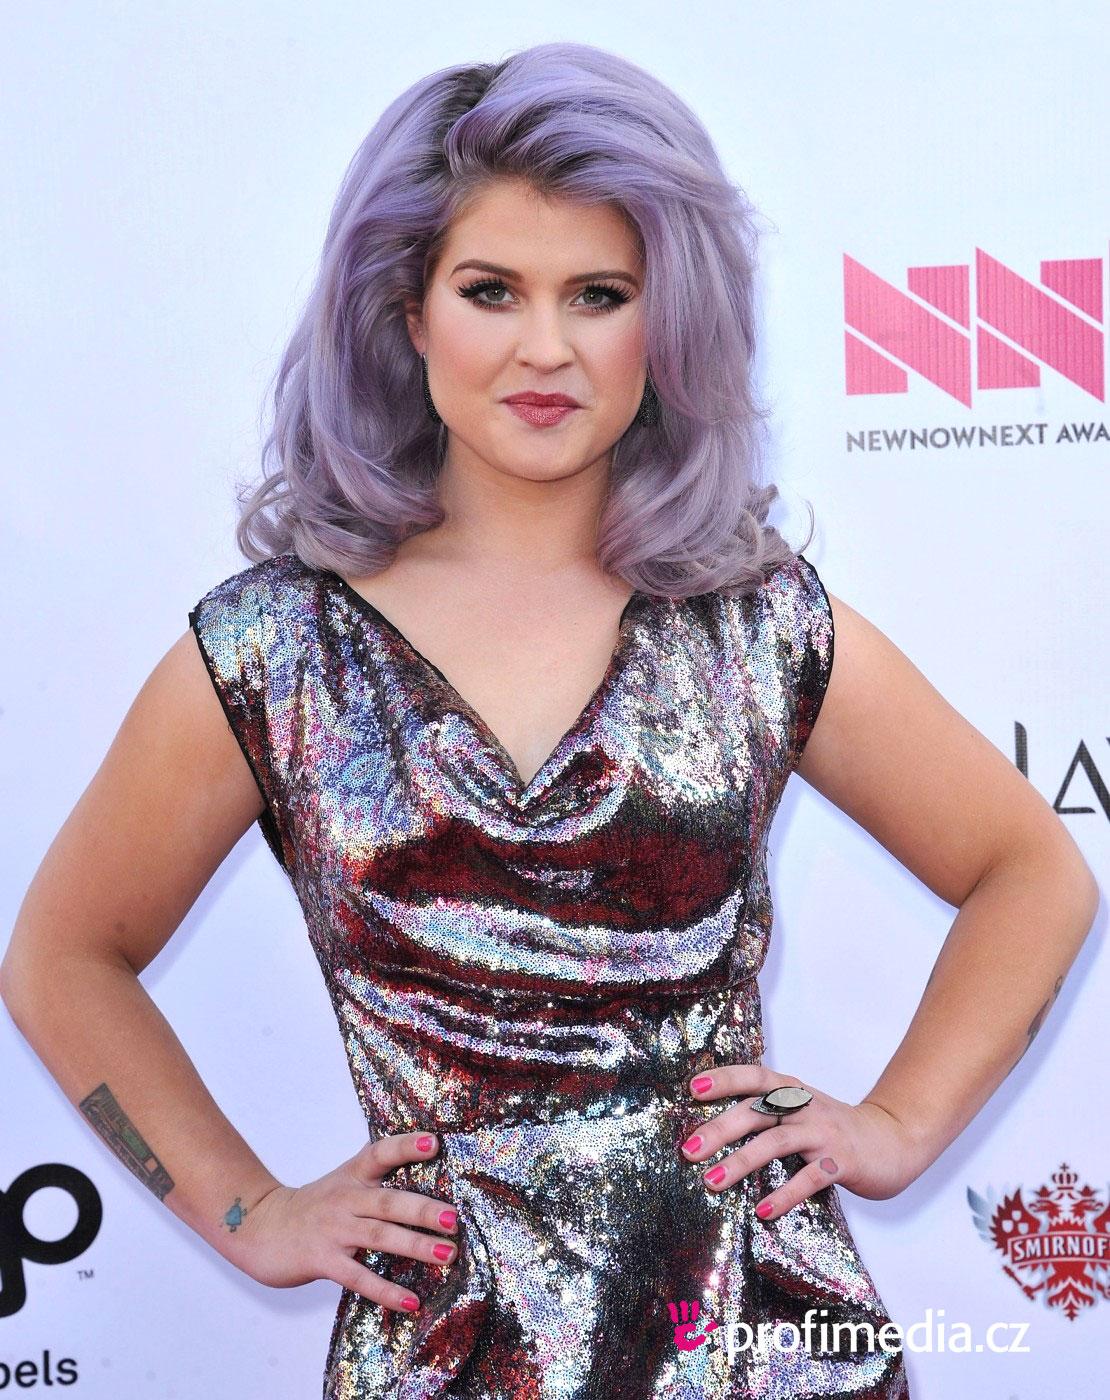 Kelly osbourne peinados de famosos en happyhair - Peinados de famosos ...